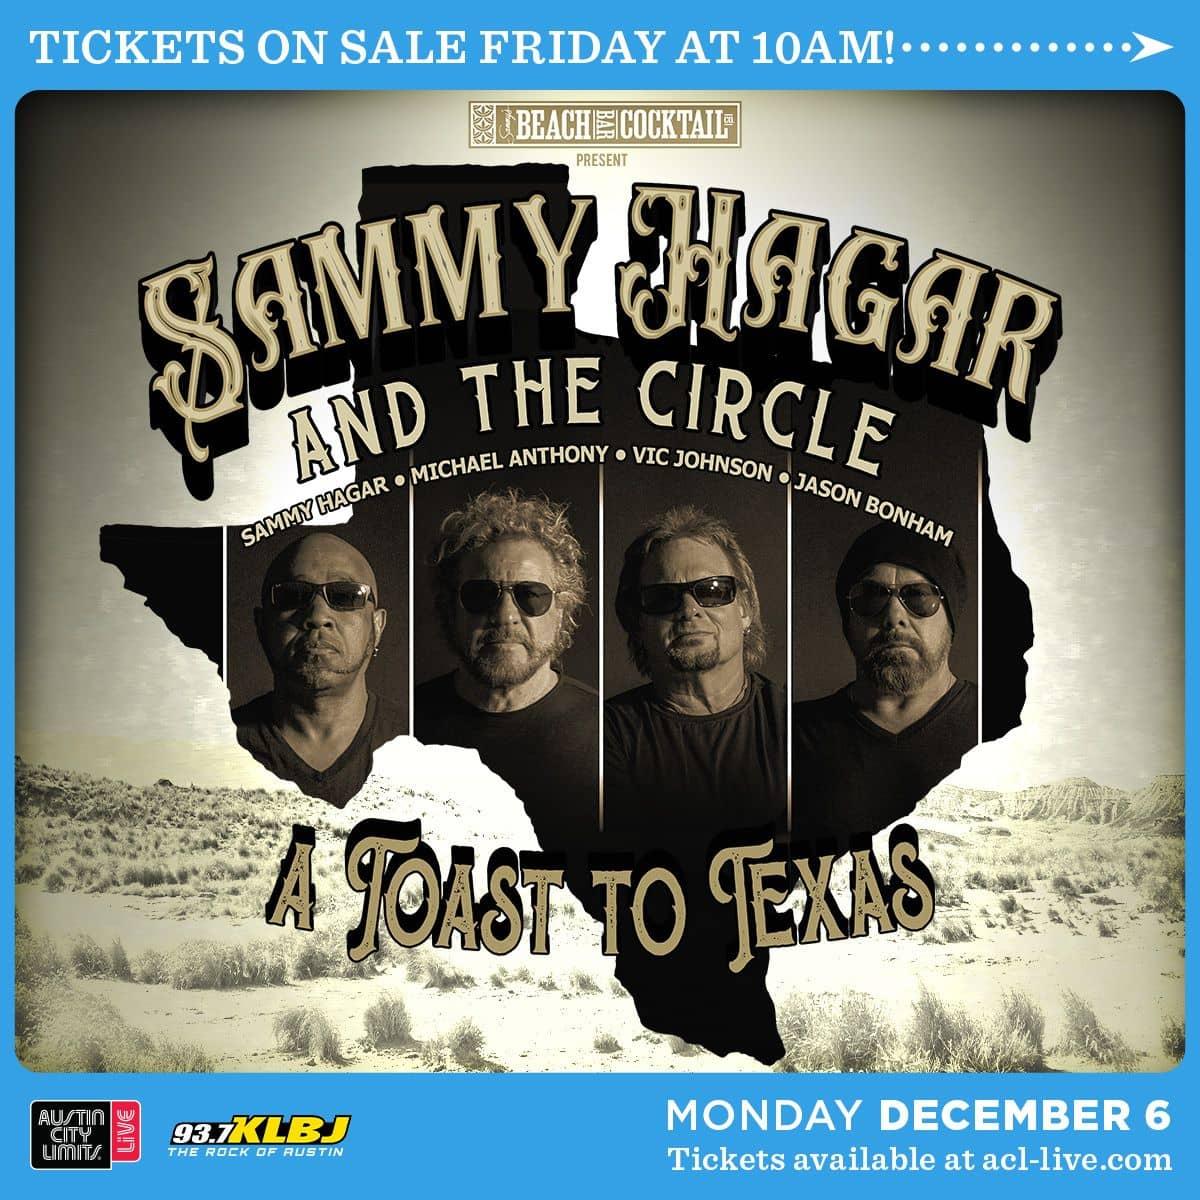 Sammy Hagar and the Circle